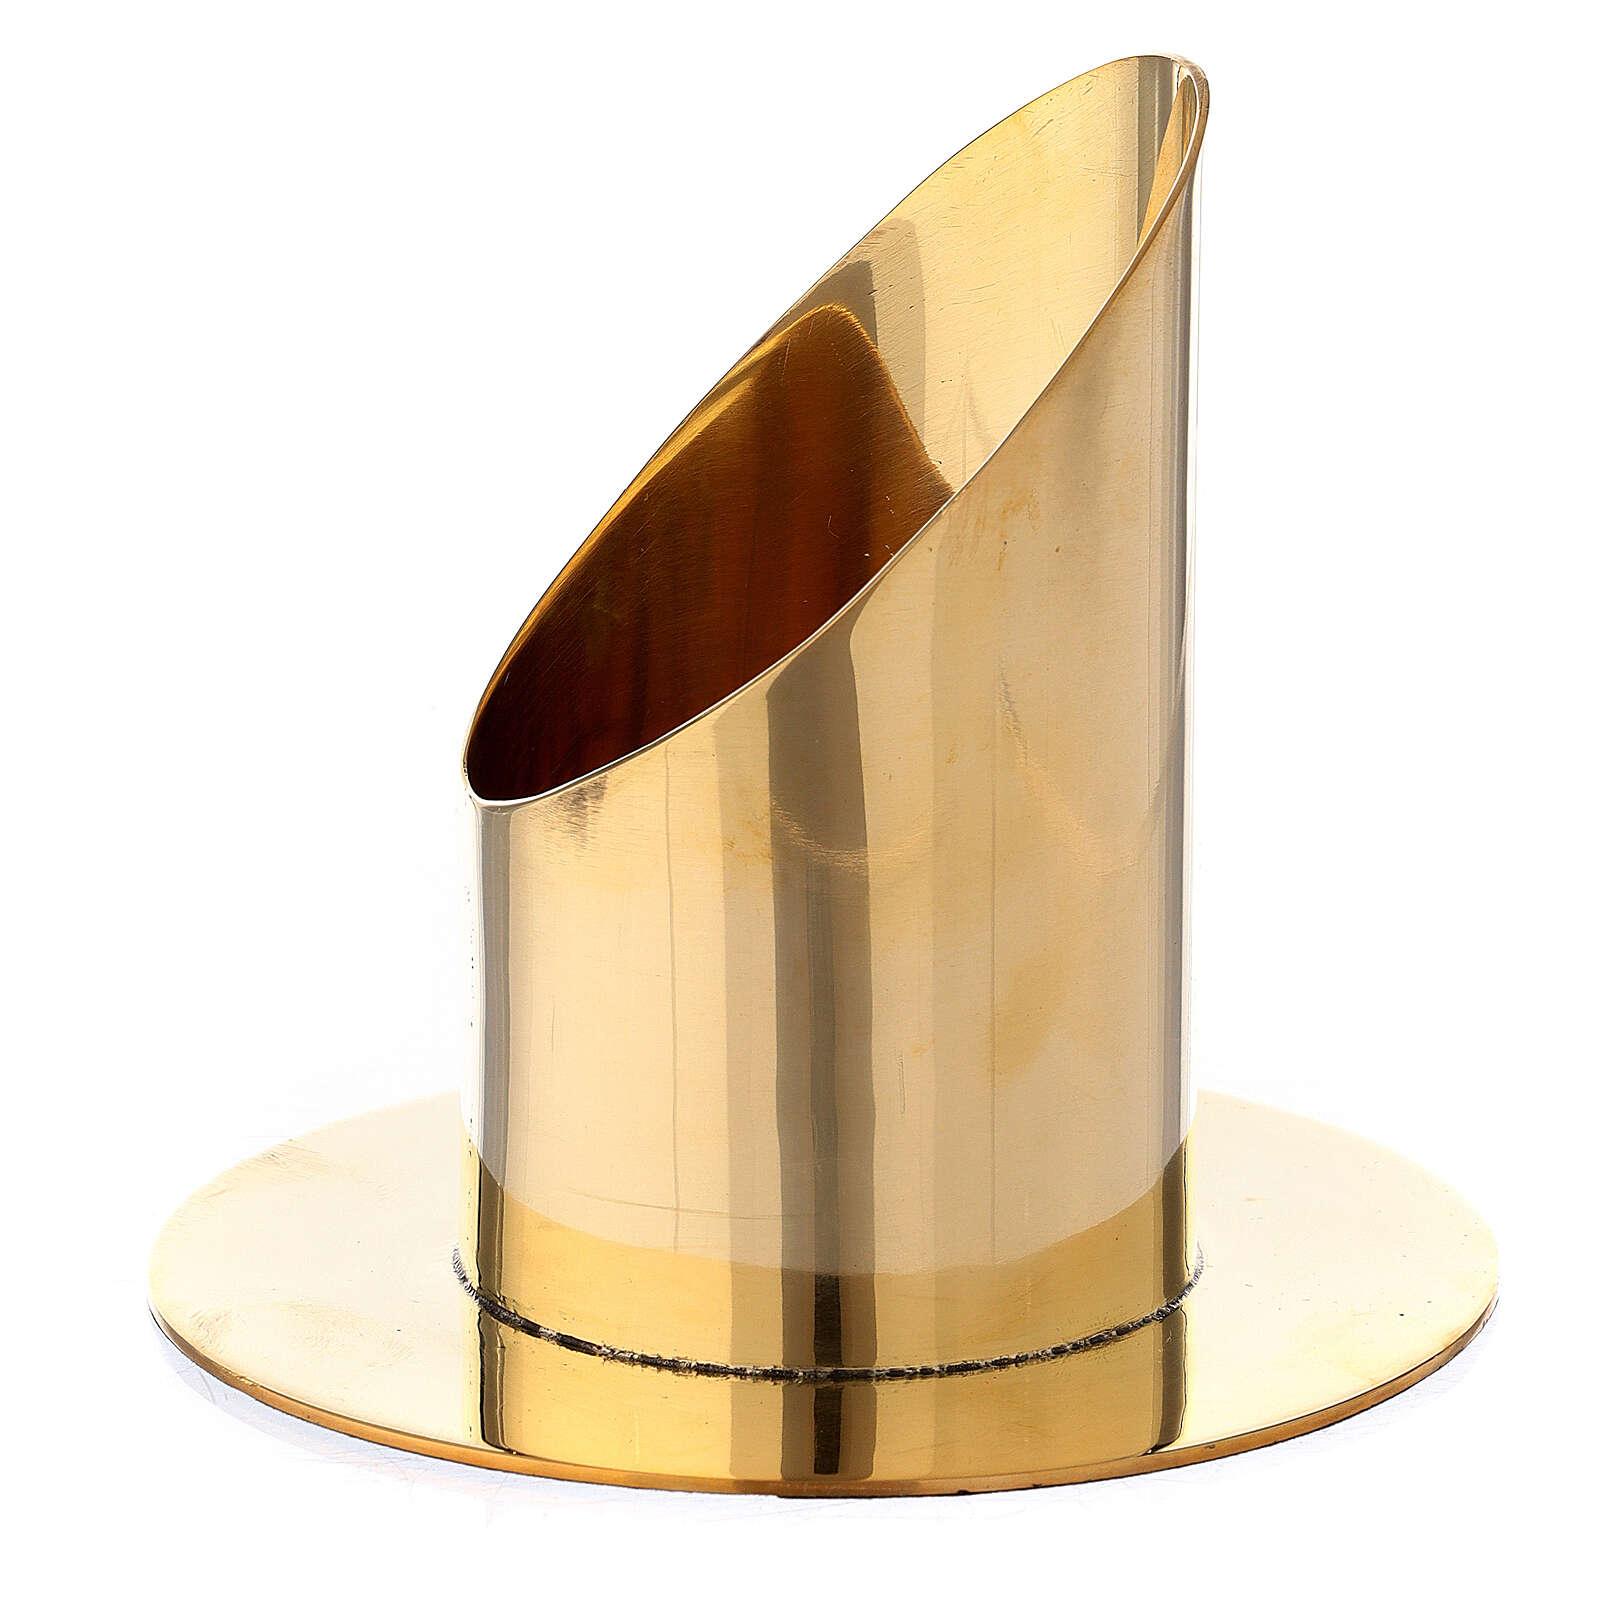 Portacandela ottone dorato lucido candela 6 cm 4